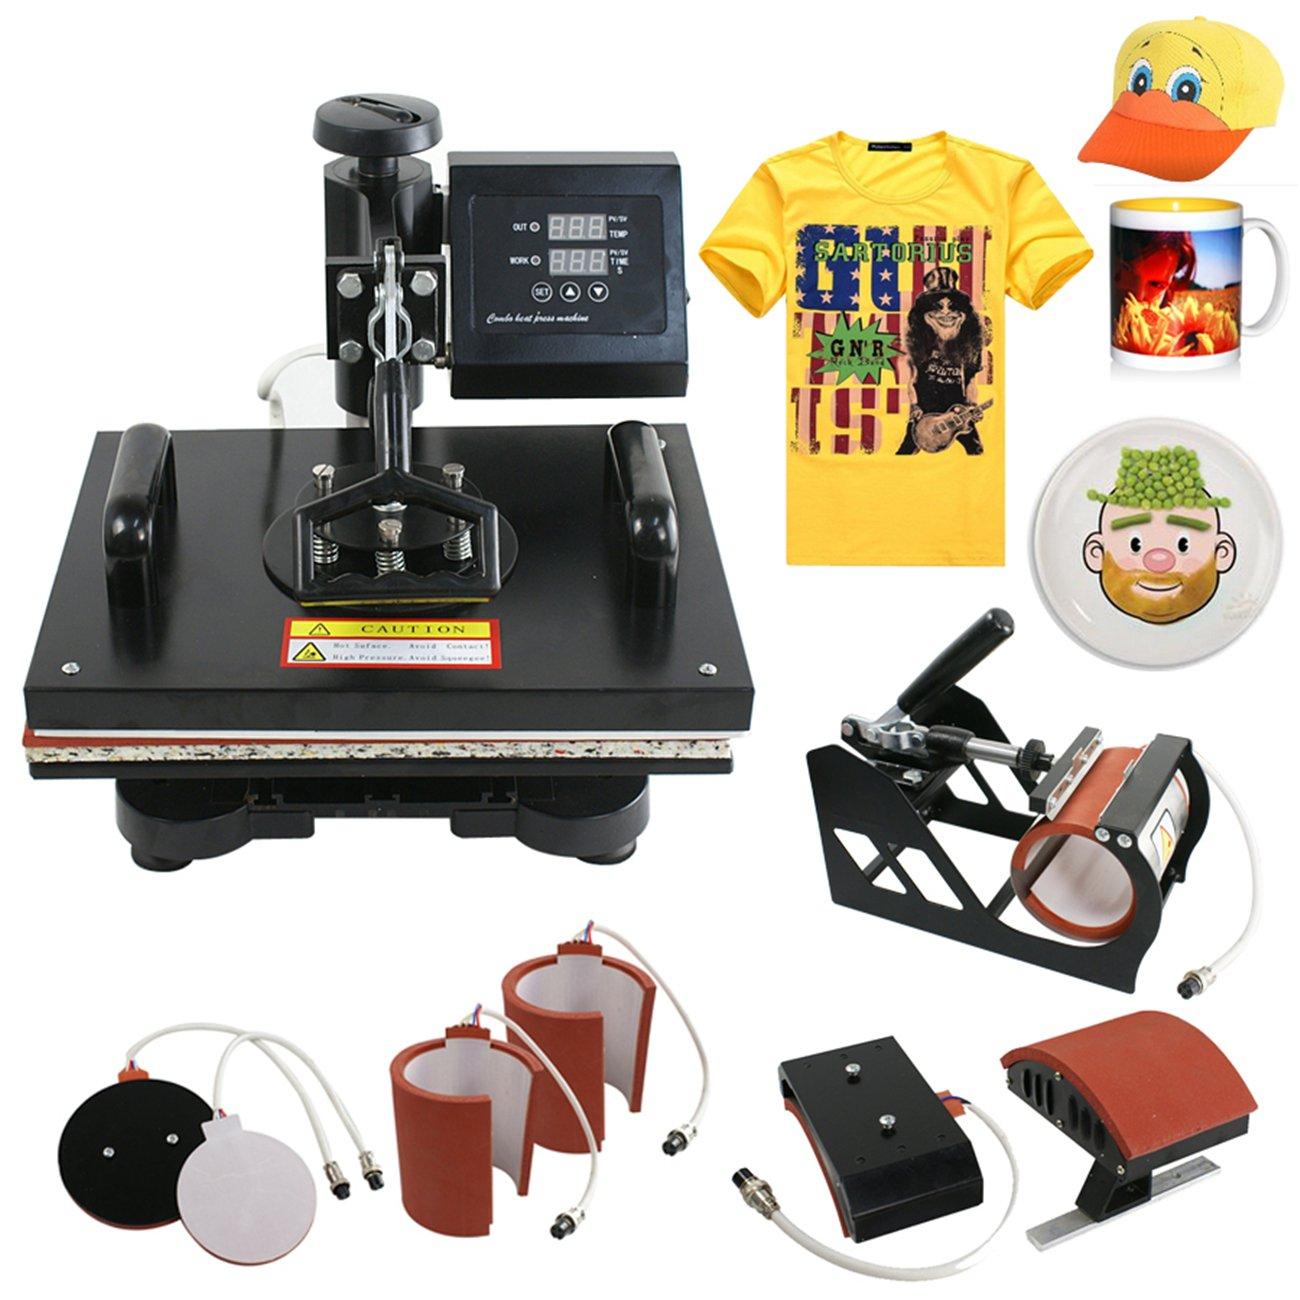 Segawe 6in1 Digital Transfer Heat Press Machine Sublimation T-shirt Mug Hat Plate Cap